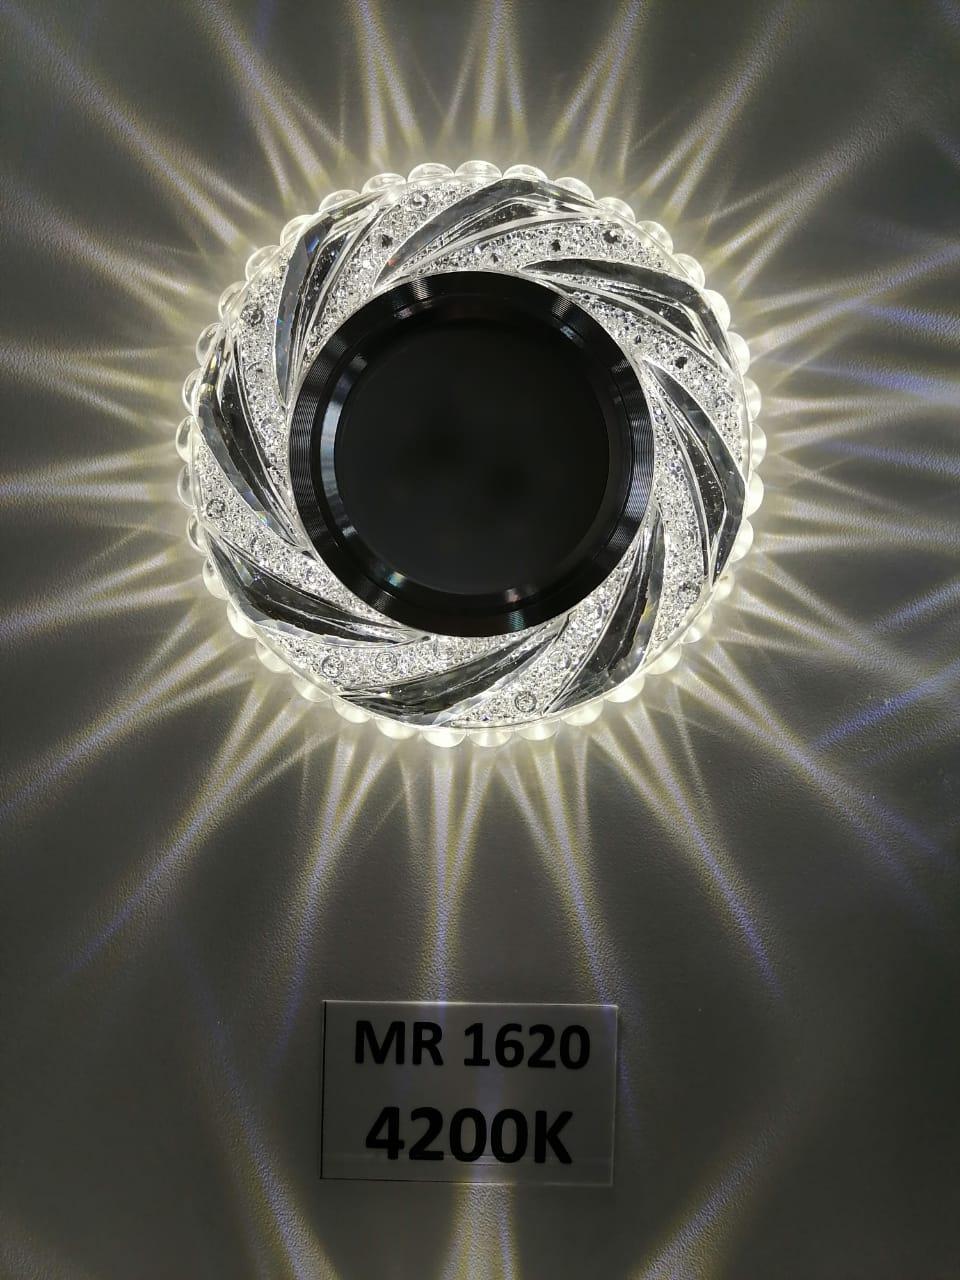 MR 1620